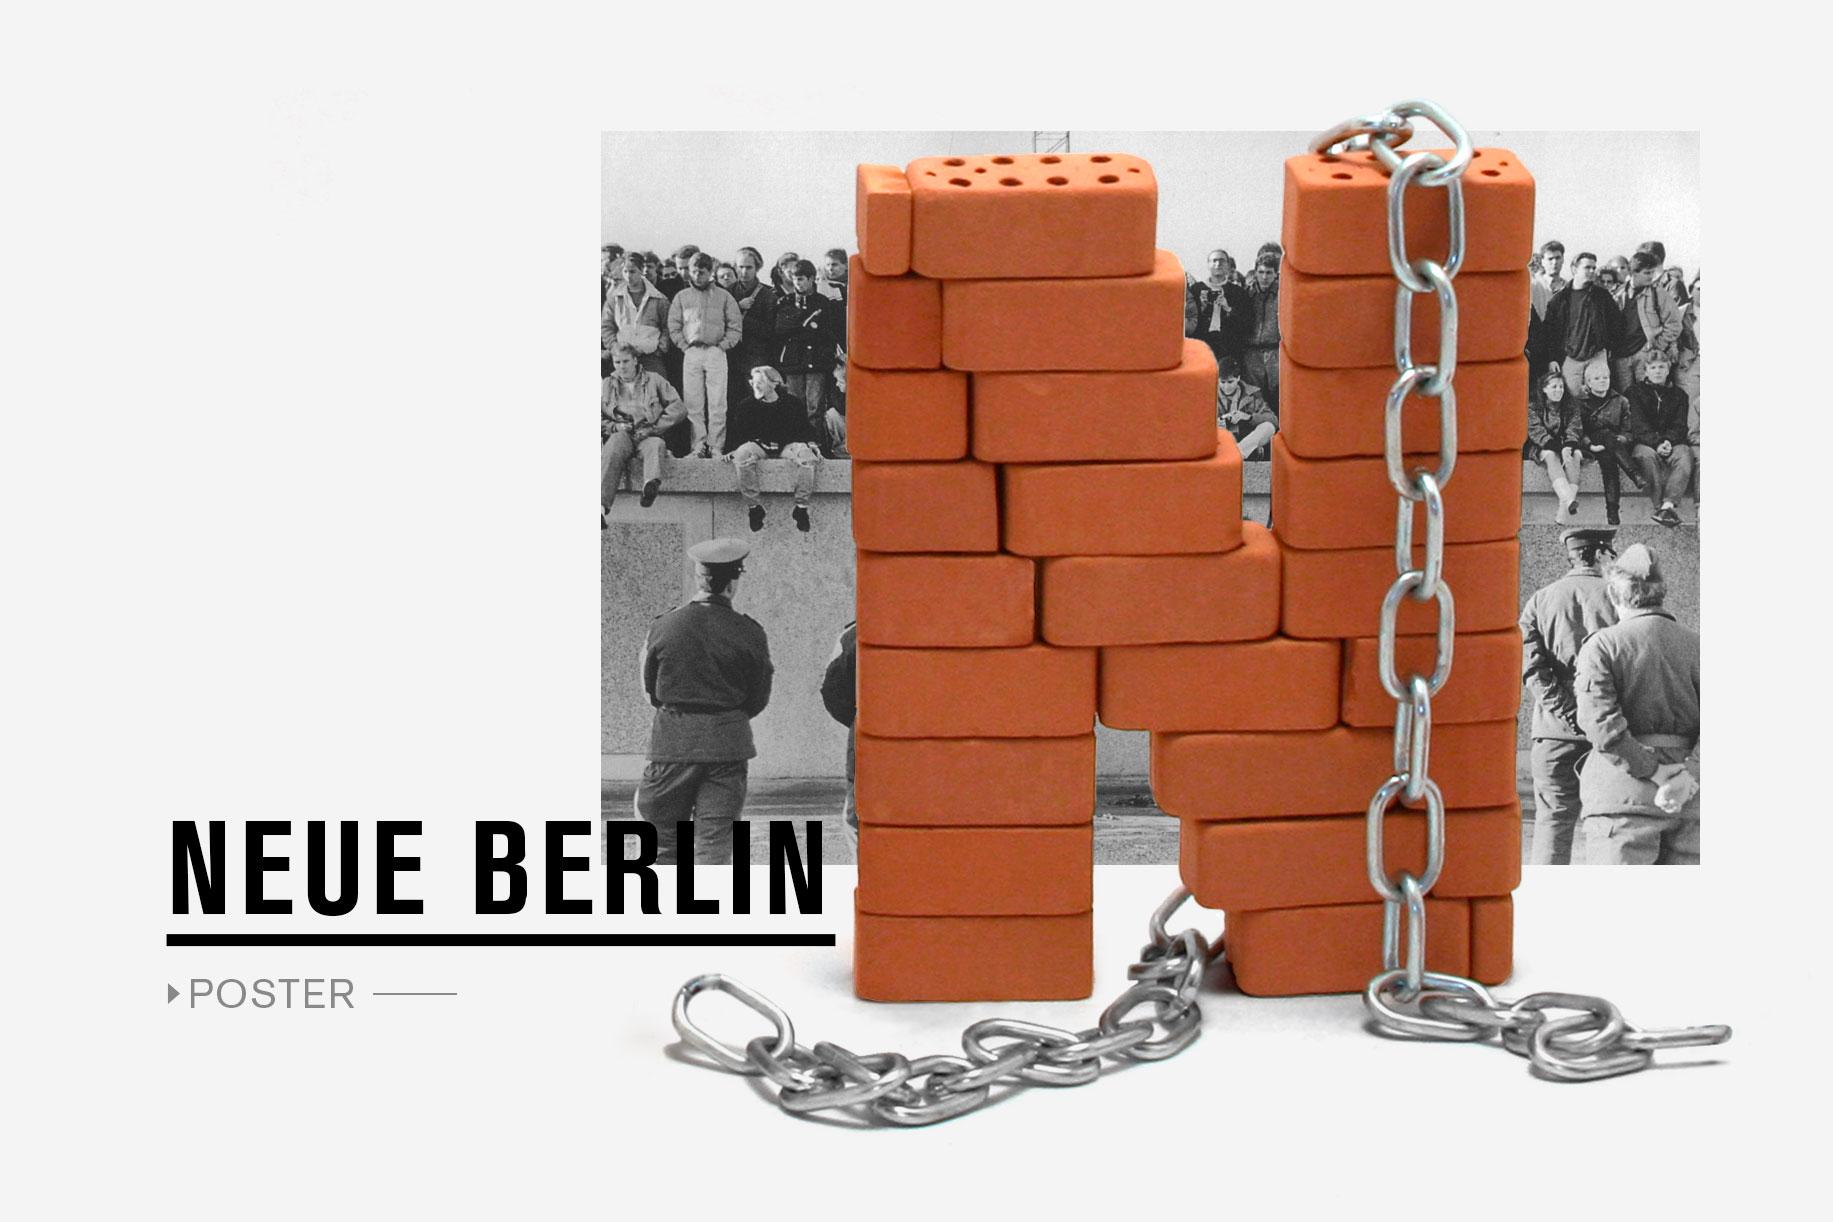 NEUE BERLIN